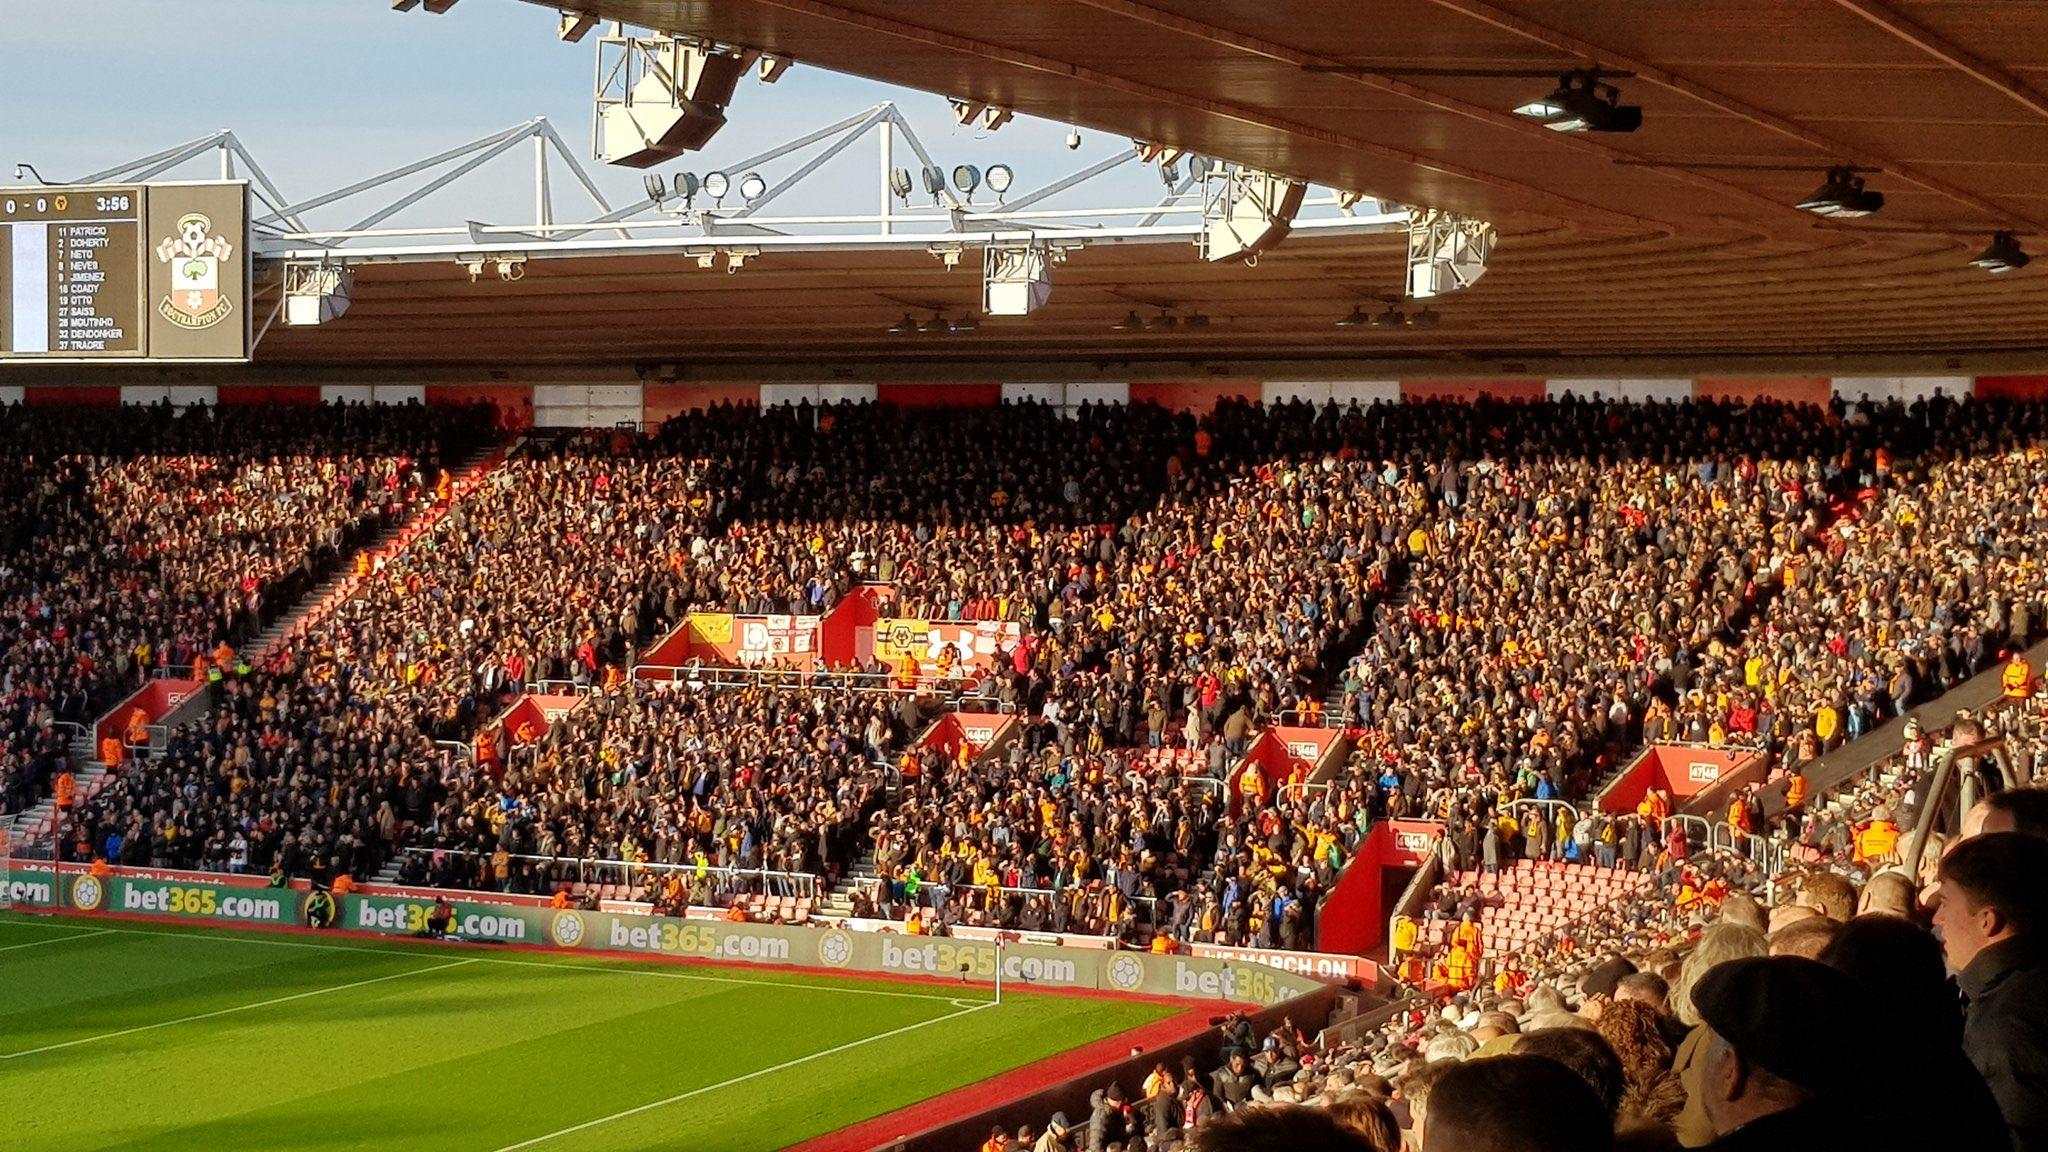 Southampton away 🐺 #wwfc #wolves #awaydays https://t.co/4Wgsm87KxU